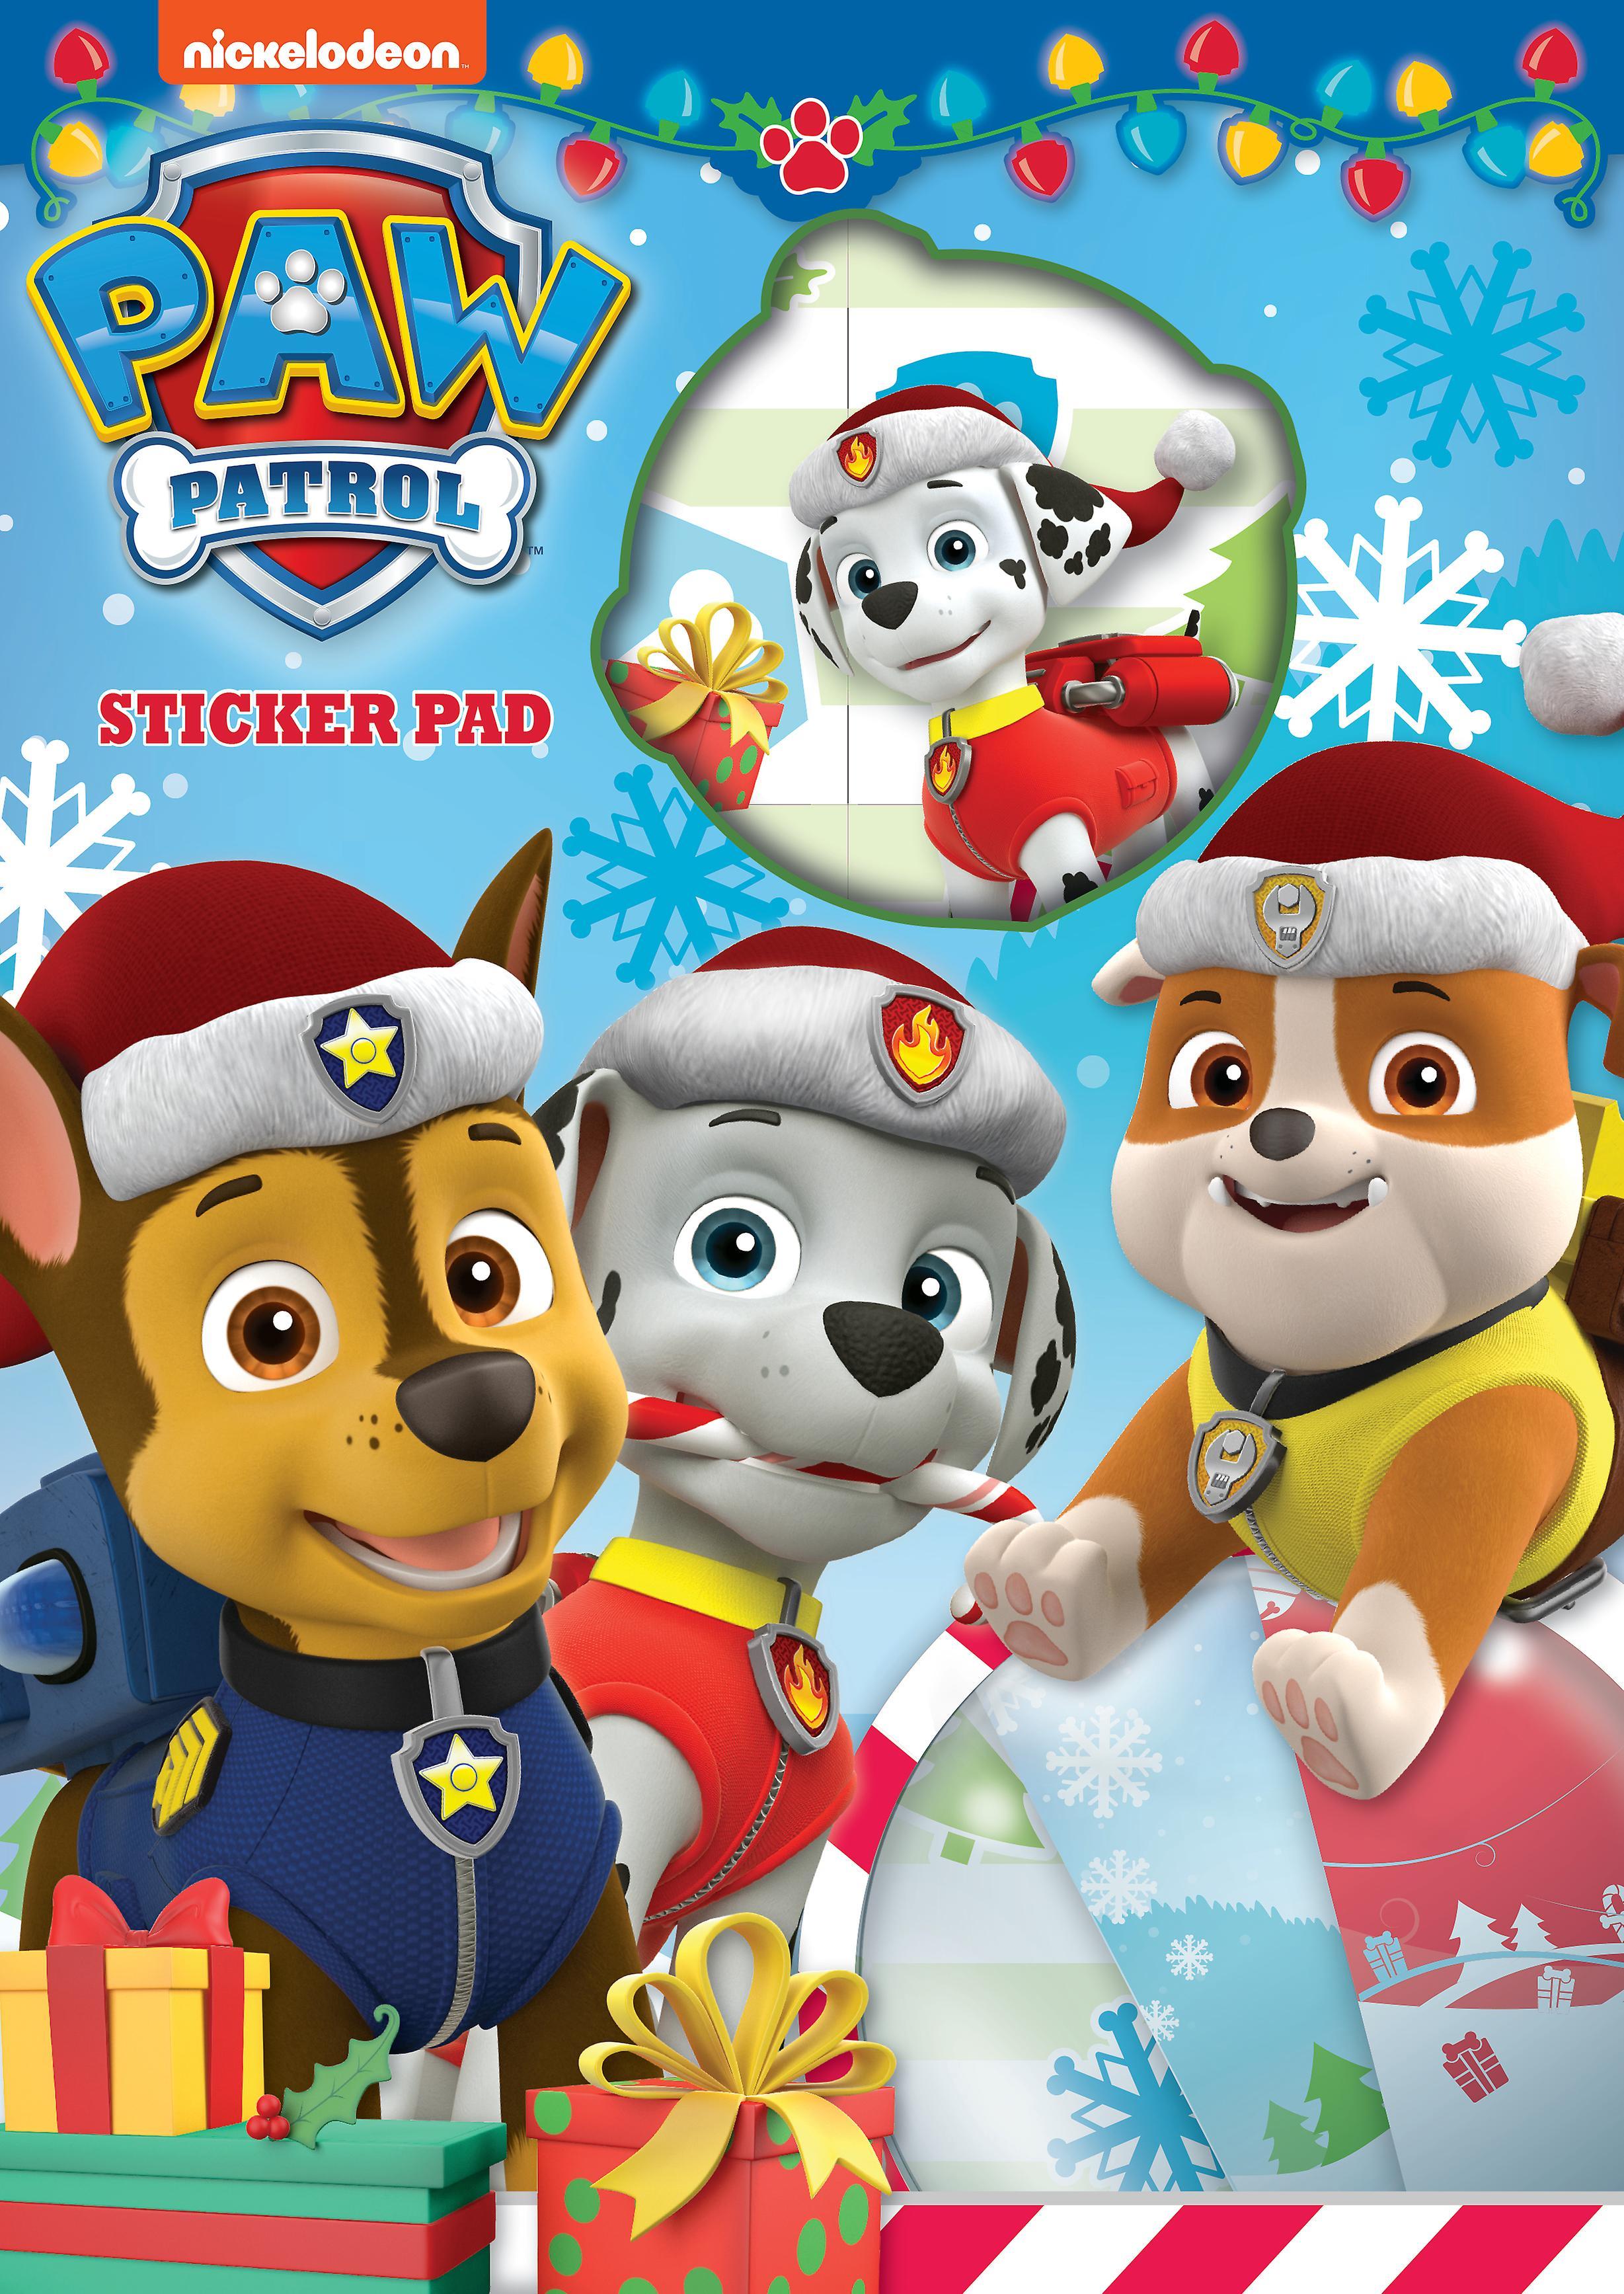 Paw Patrol Christmas Sticker Pad Over 25 Stickers.